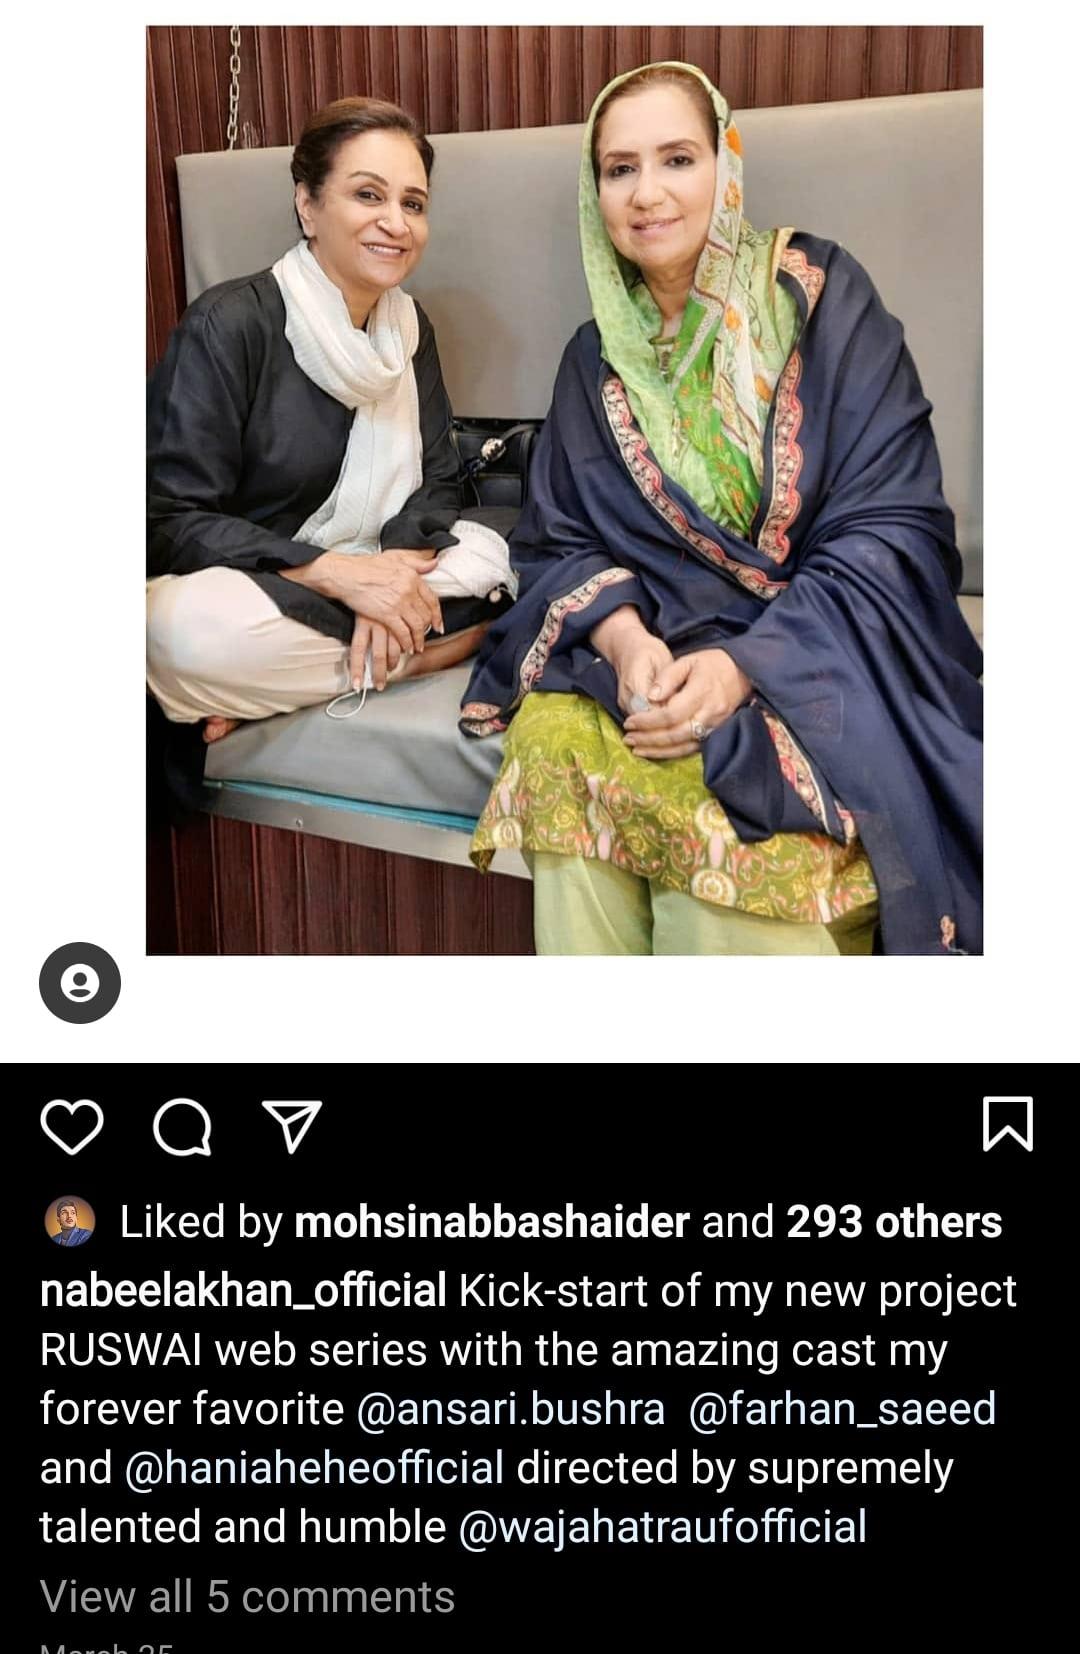 Hania Aamir and Farhan Saeed Starrer Web Series Ruswai